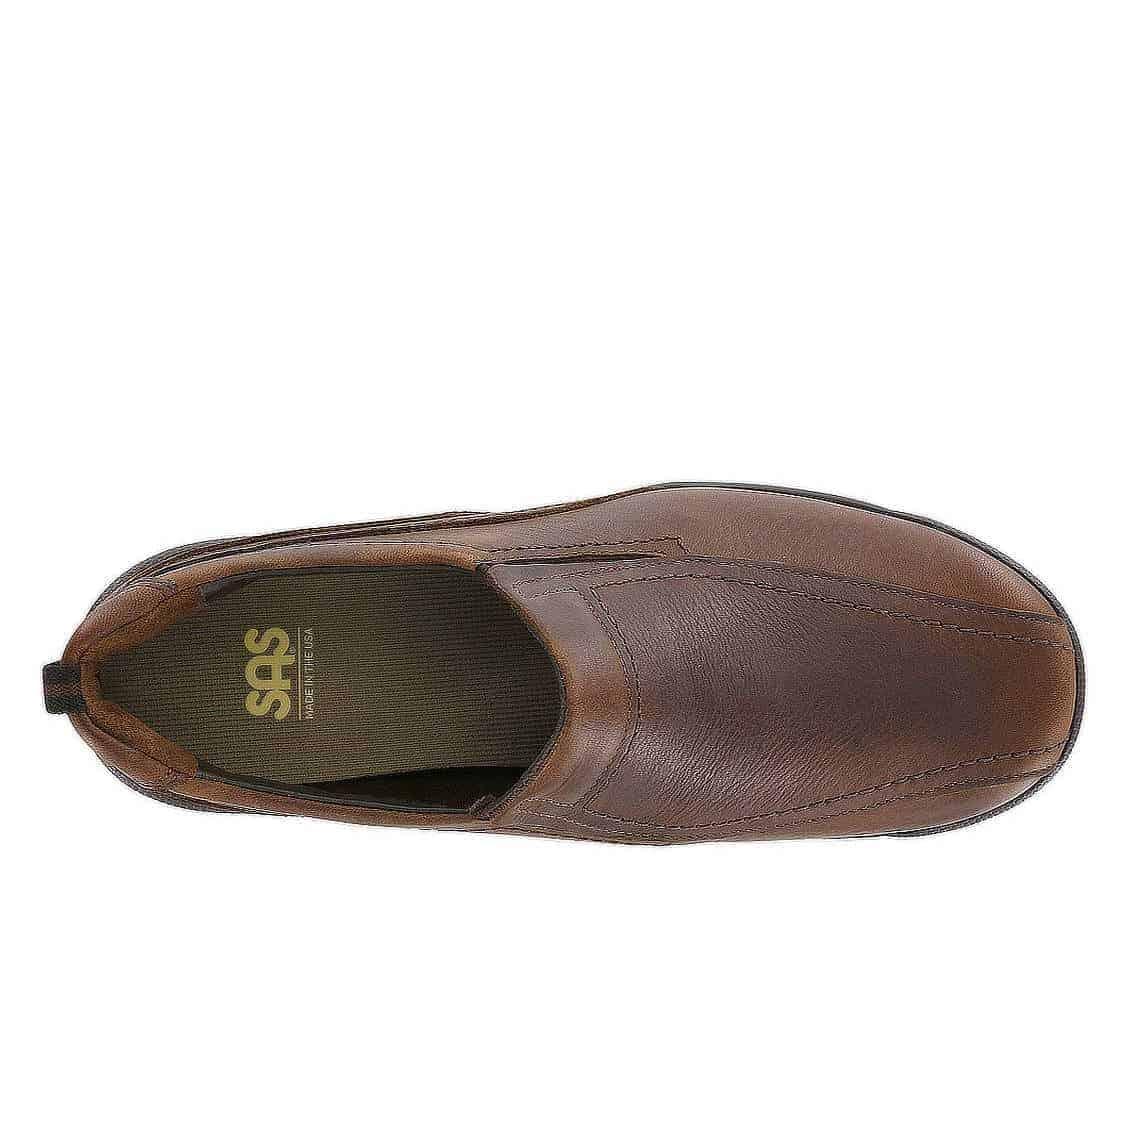 sas-mens-cruise-on-brown-3030-058-3